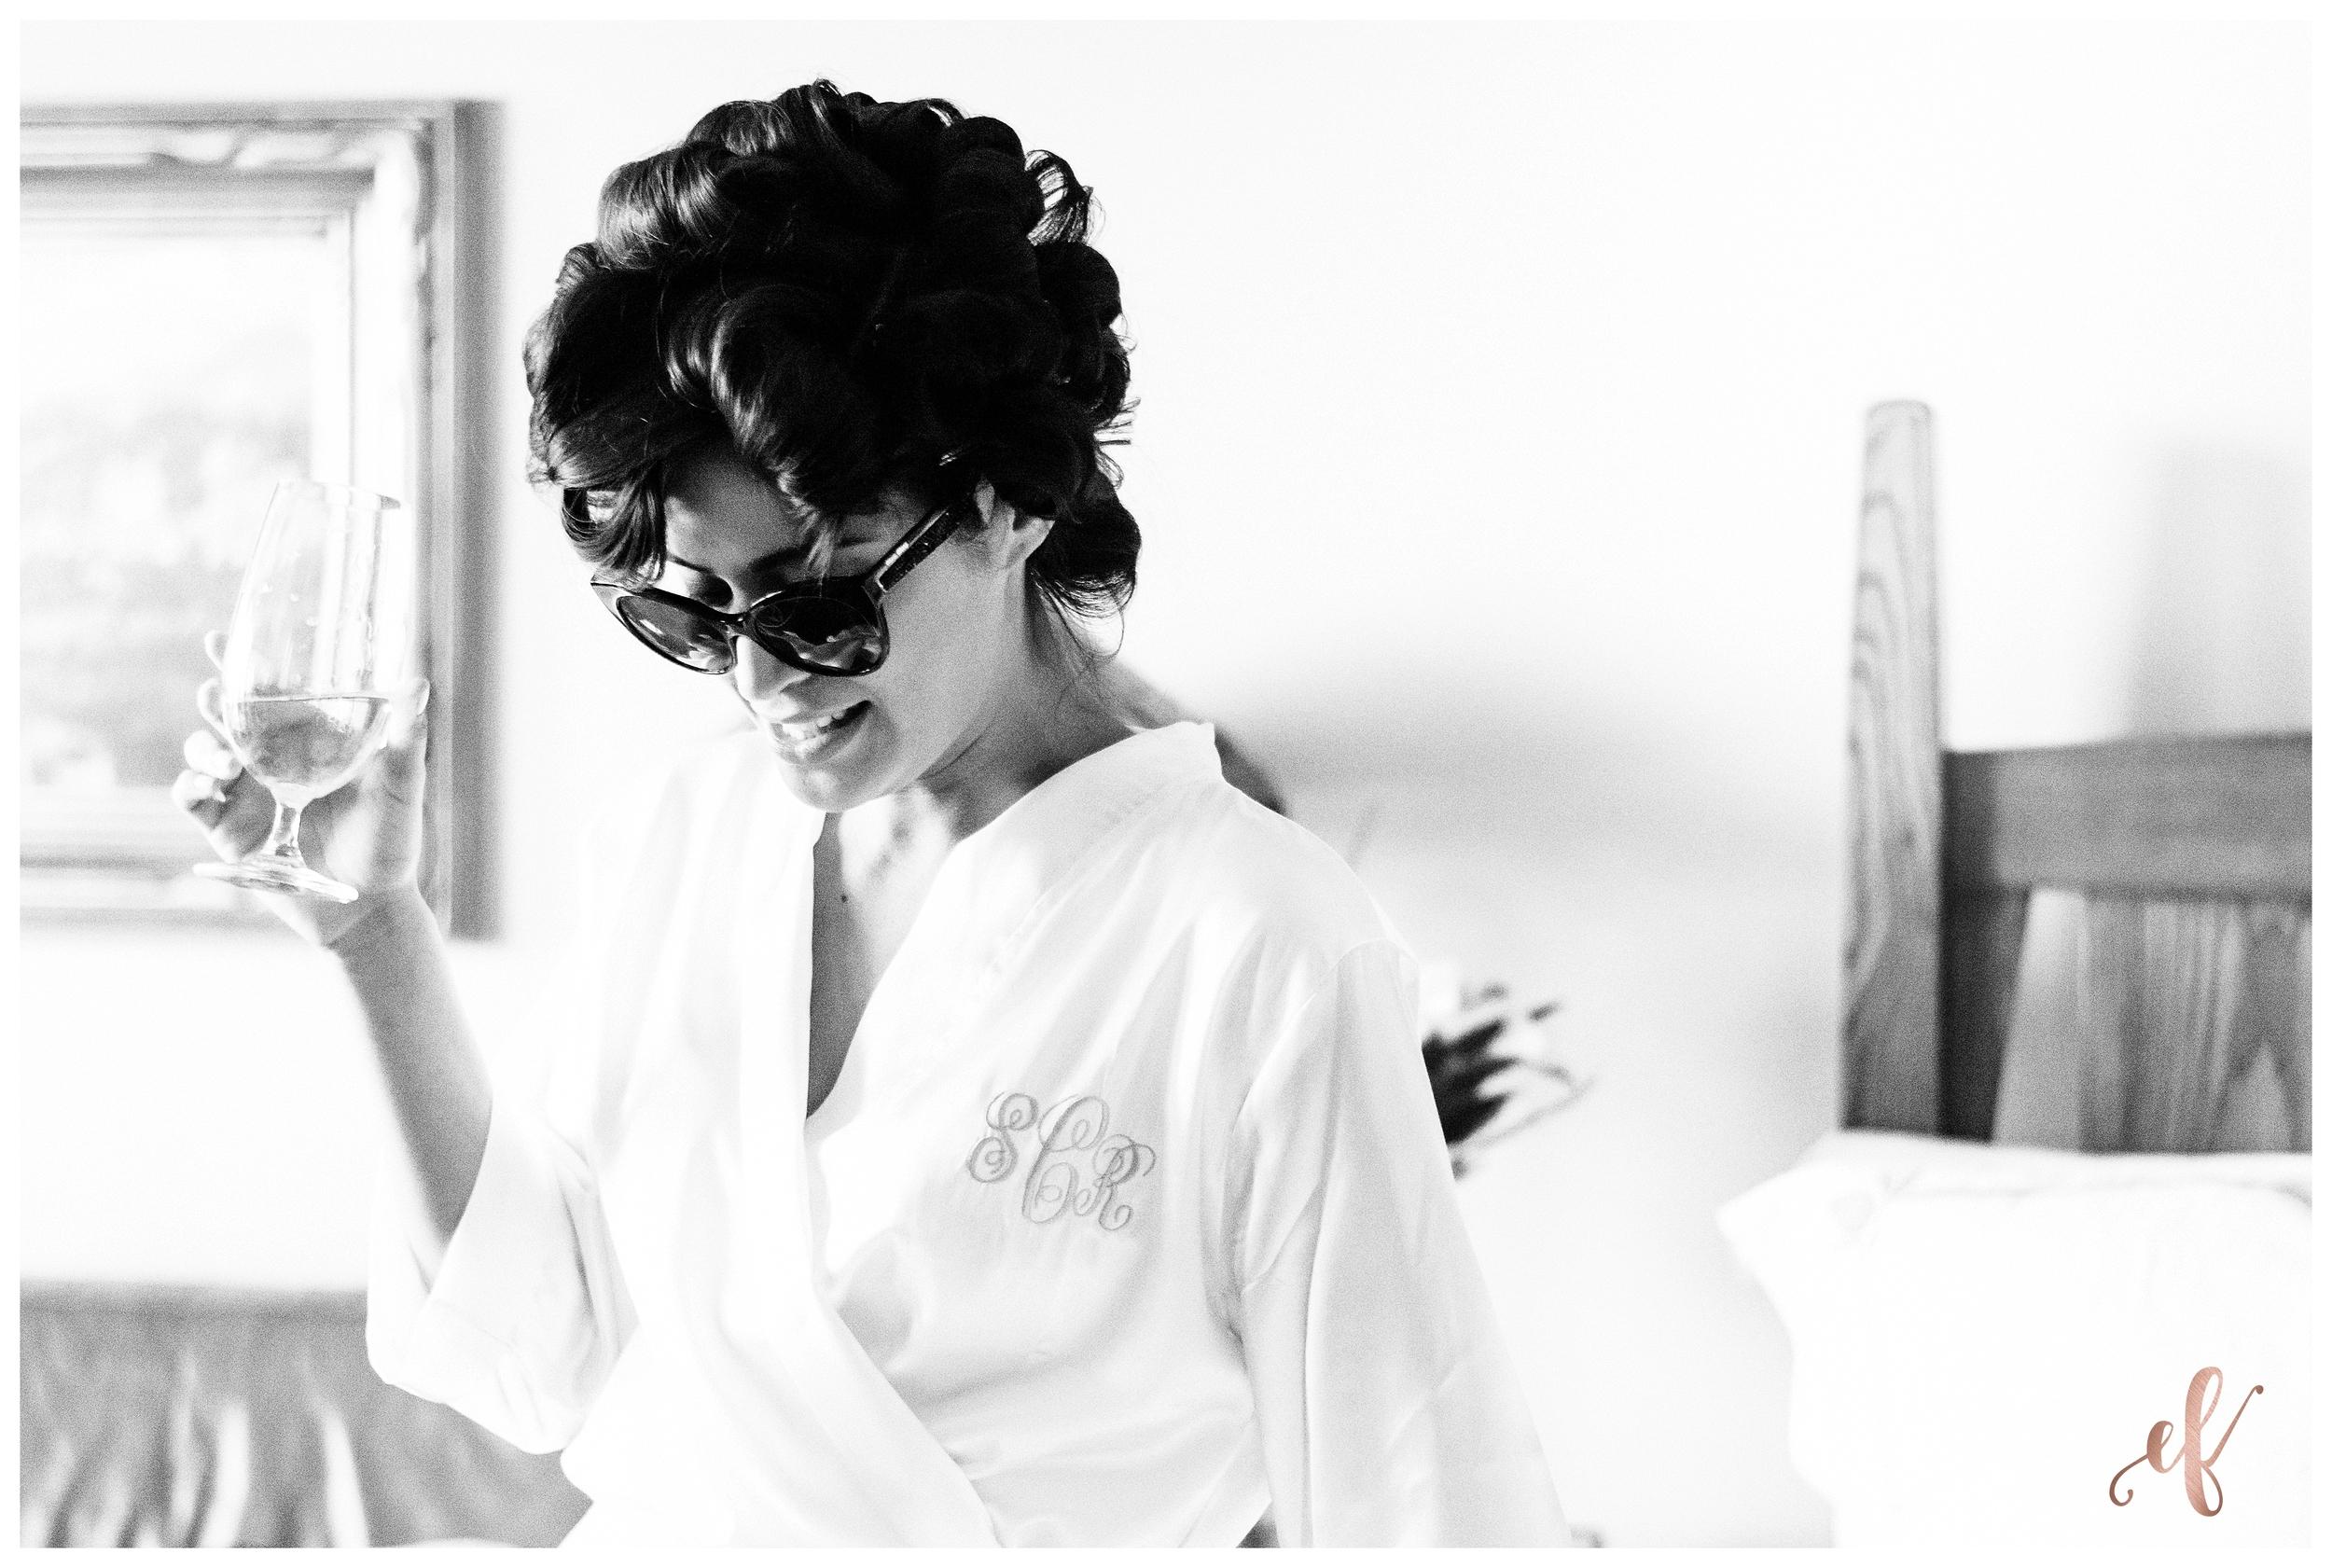 San Diego Wedding Photographer   Ernie & Fiona Photography   Bride   Sunglasses   Robe   Prep